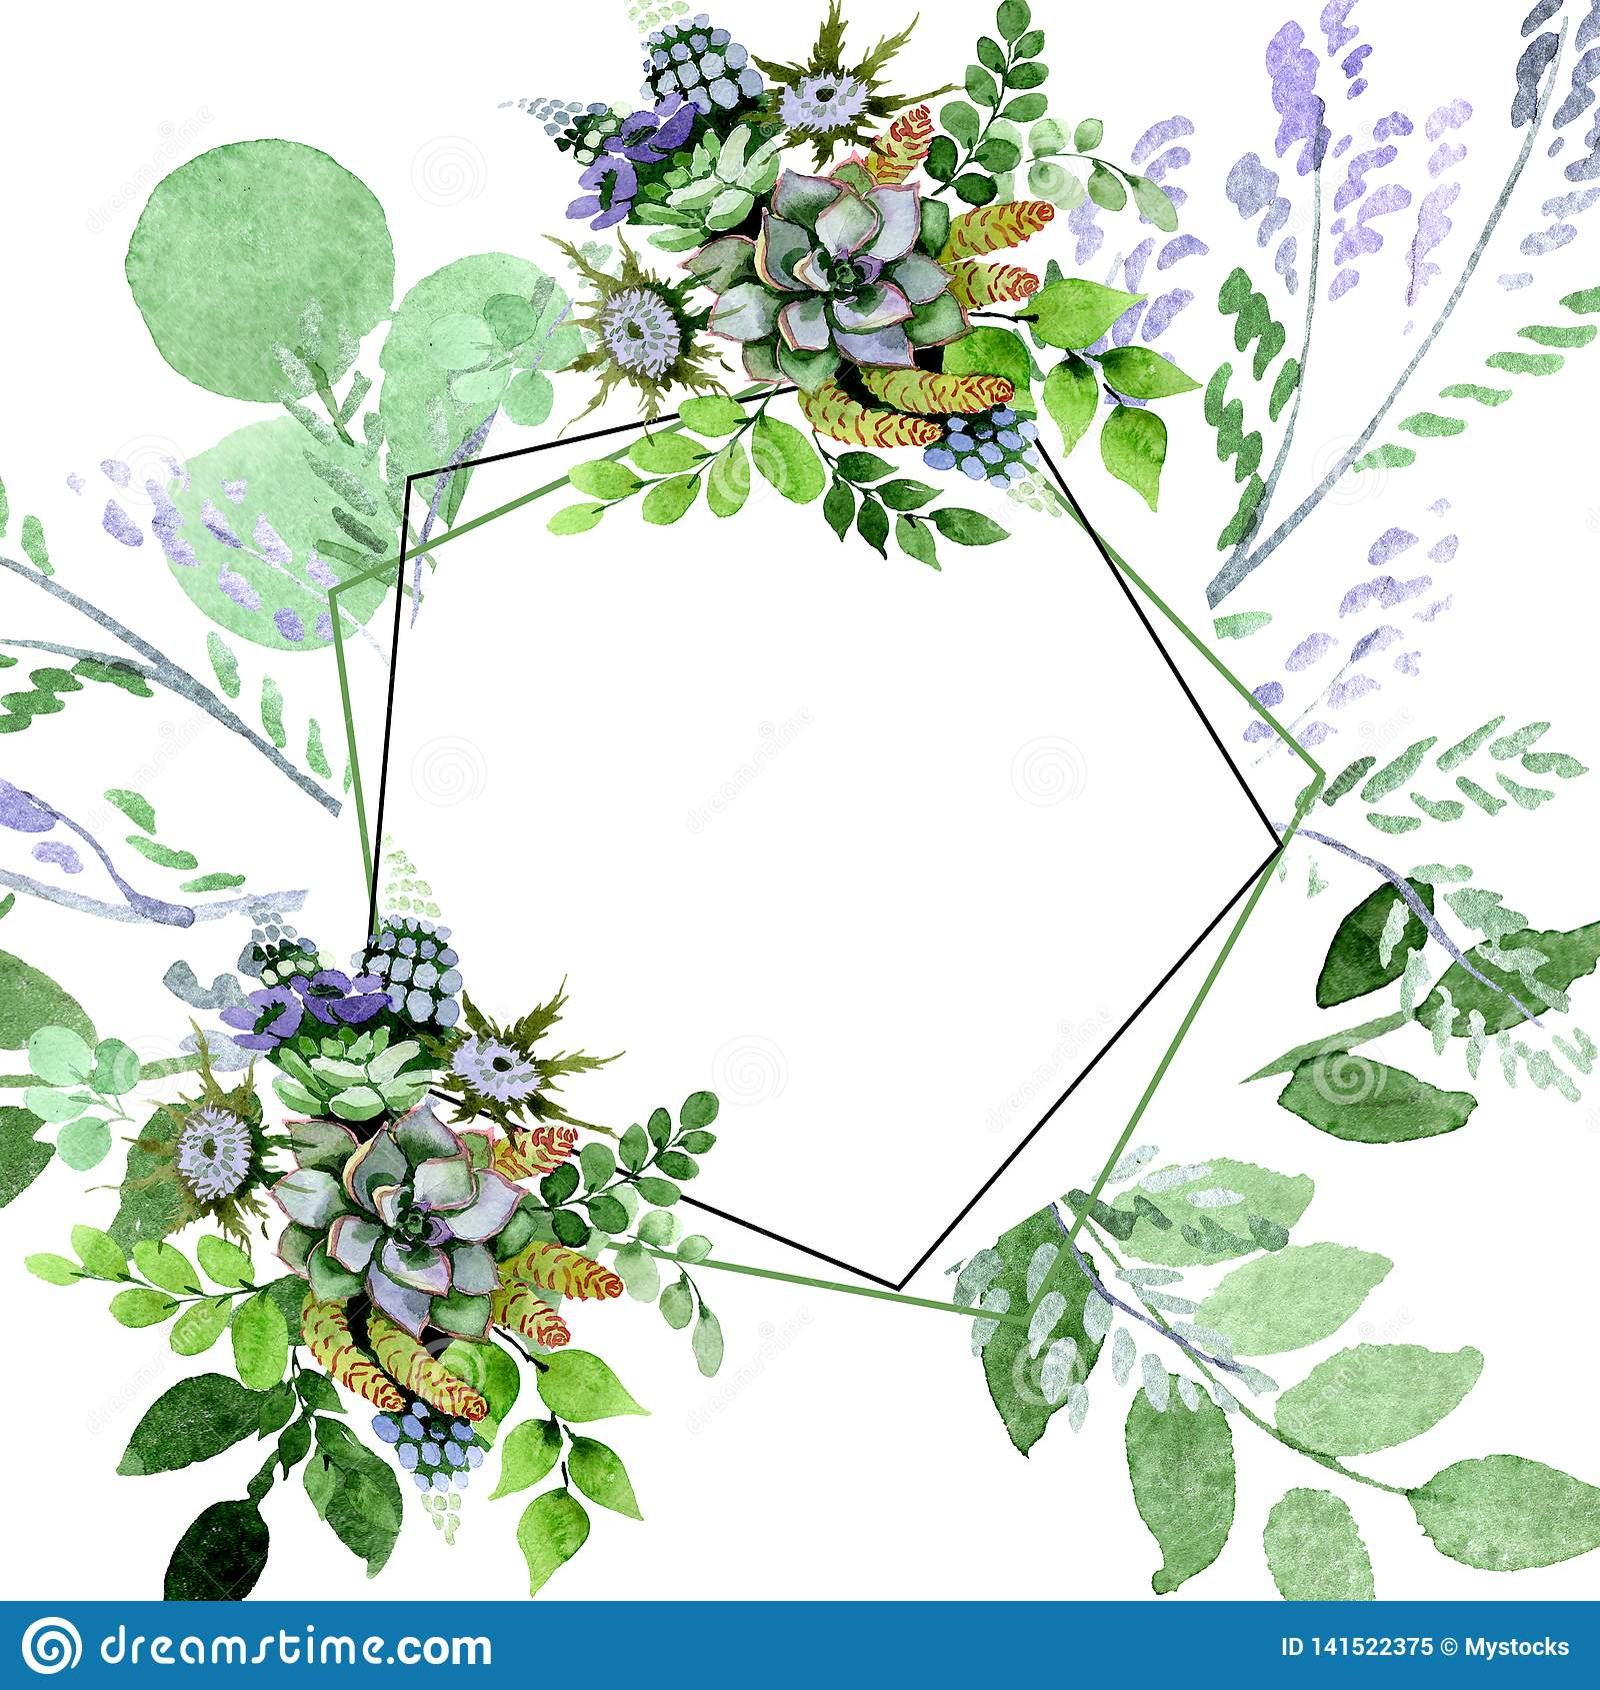 Succulent Floral Watercolor Stock Illustrations 14 068 Succulent Floral Watercolor Stock Illustrations Vectors Clipart Dreamstime